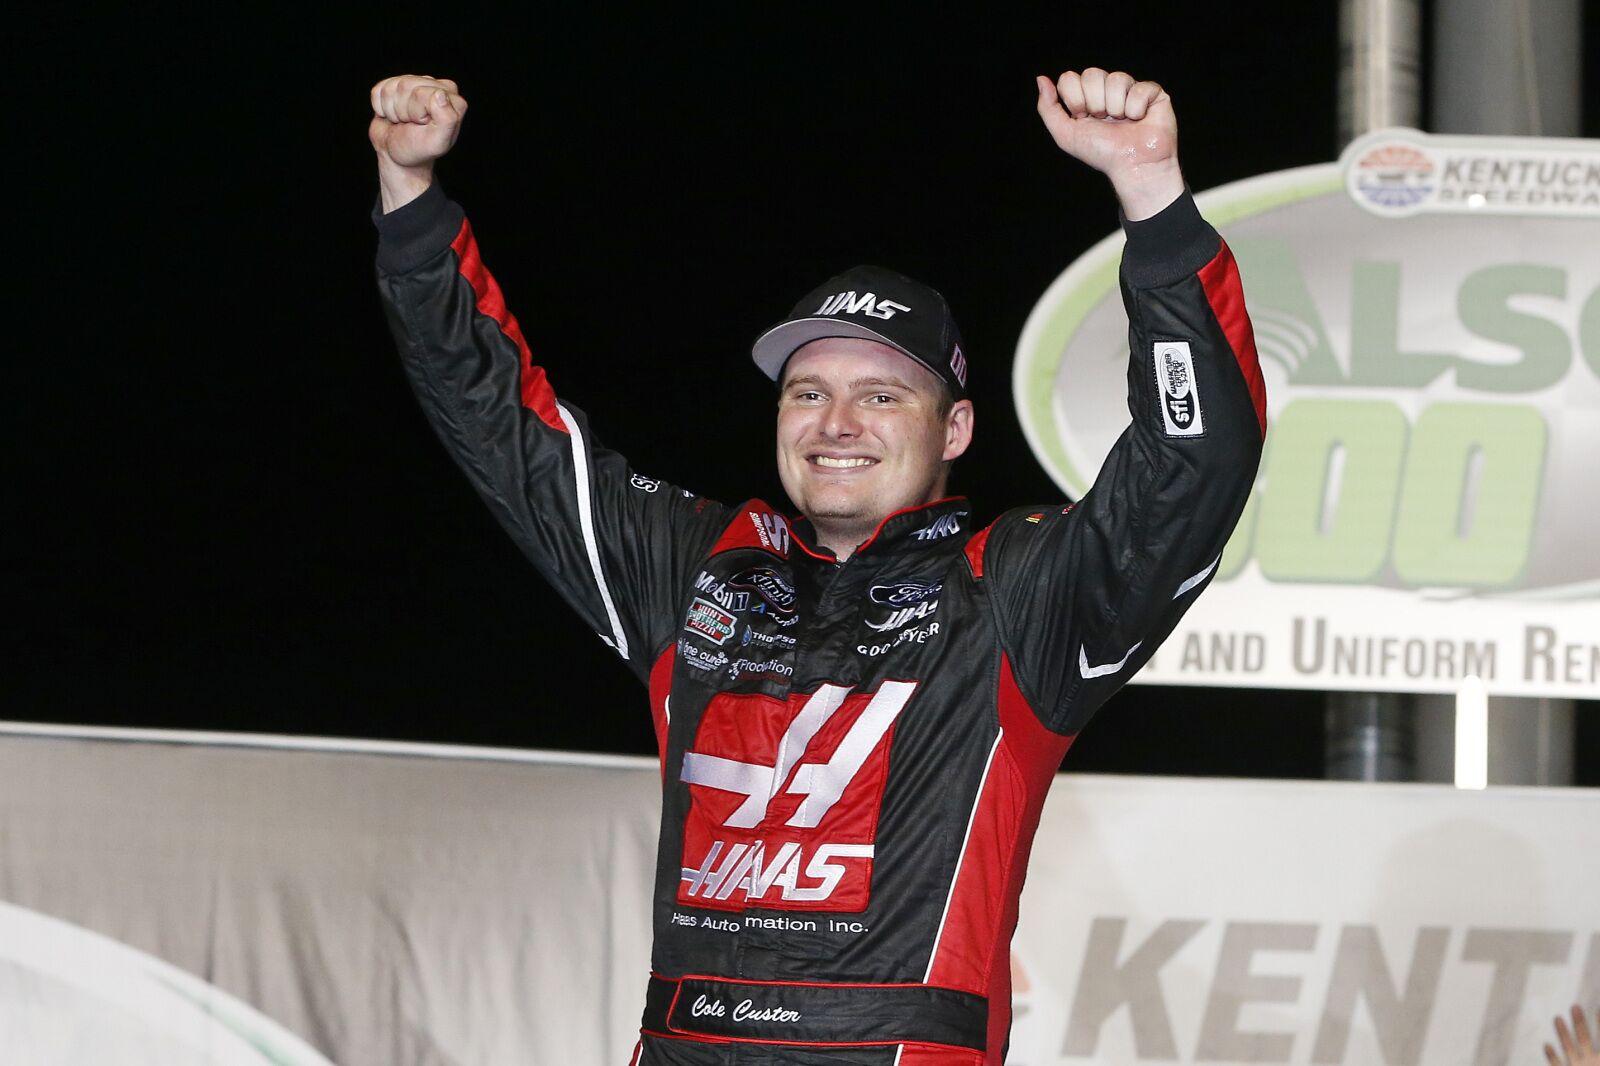 NASCAR Xfinity Series: Cole Custer wins 2019 Alsco 300